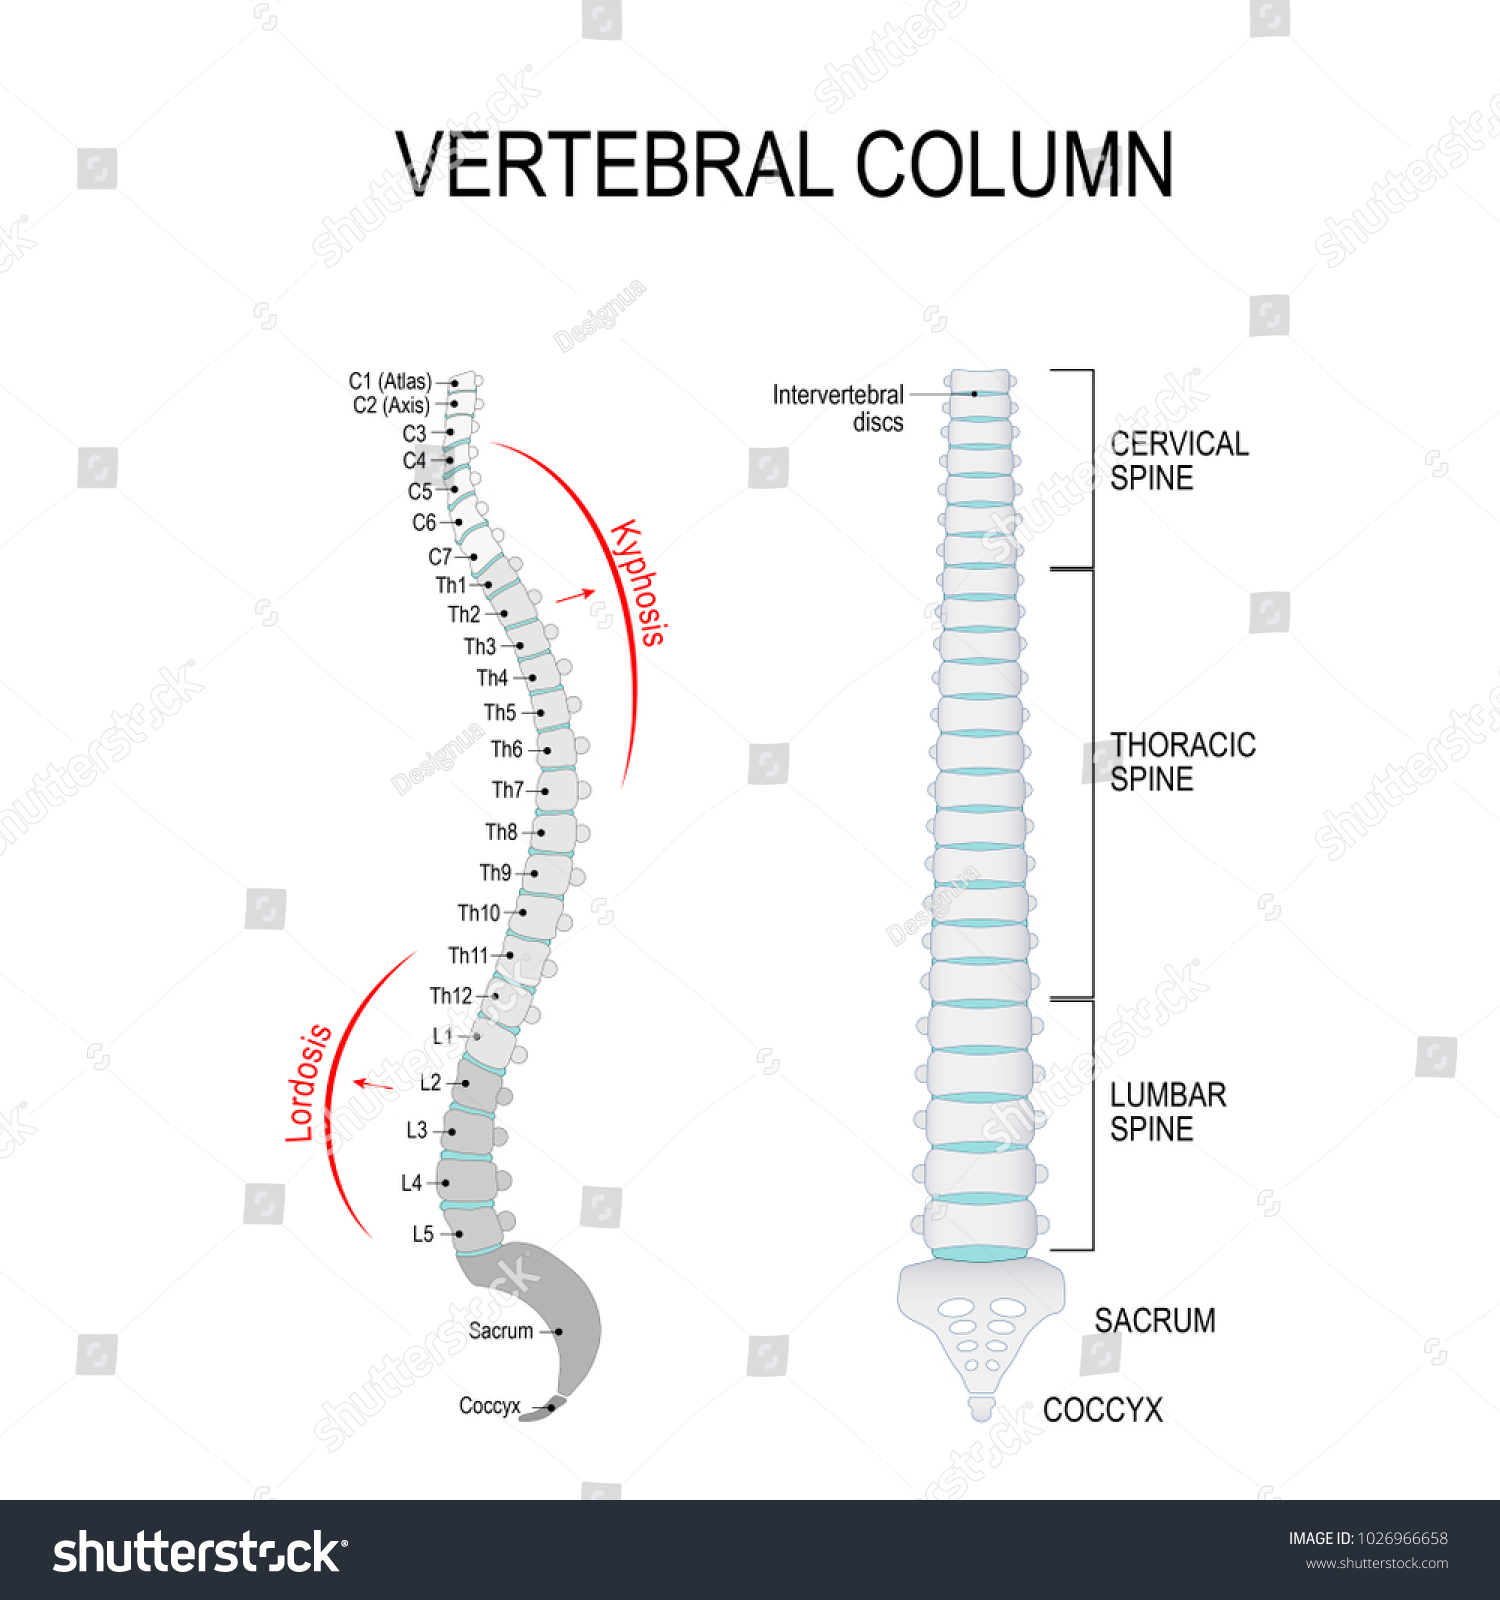 Vertebral Column Cervical Thoracic Lumbar Spine Stock Illustration